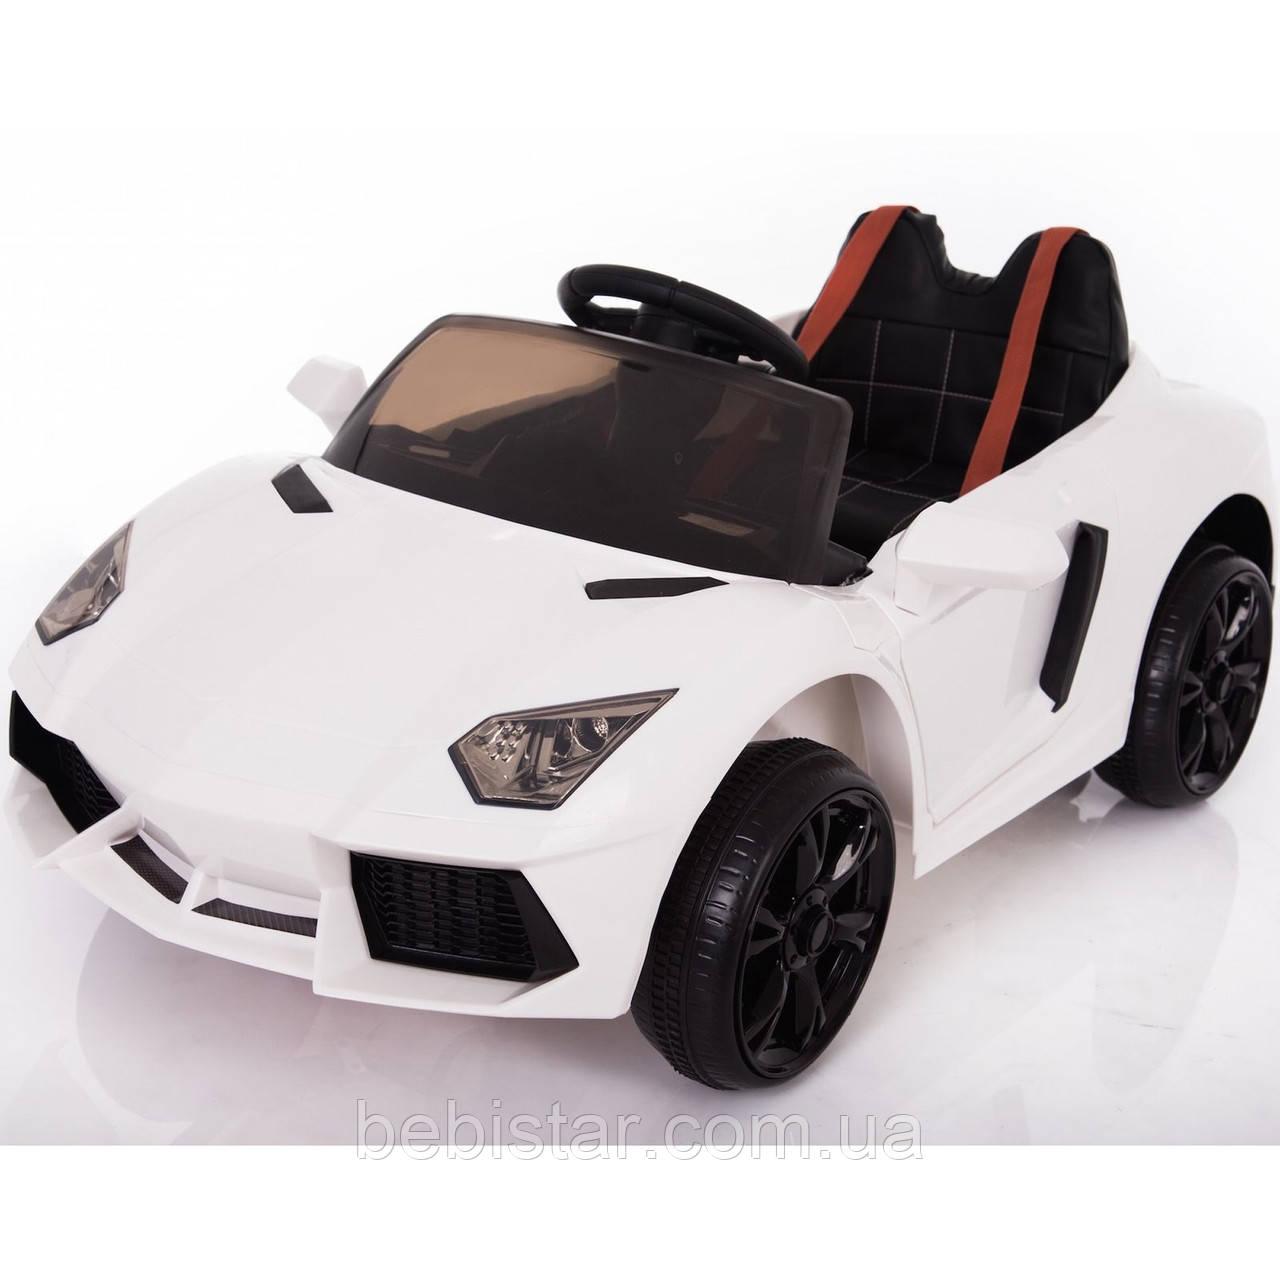 Электромобиль спорткар белый Т-753 WHITE для деток 3-8 лет с пультом мотор 2*15W, аккумулятор 2*6V4.5AH с MP3